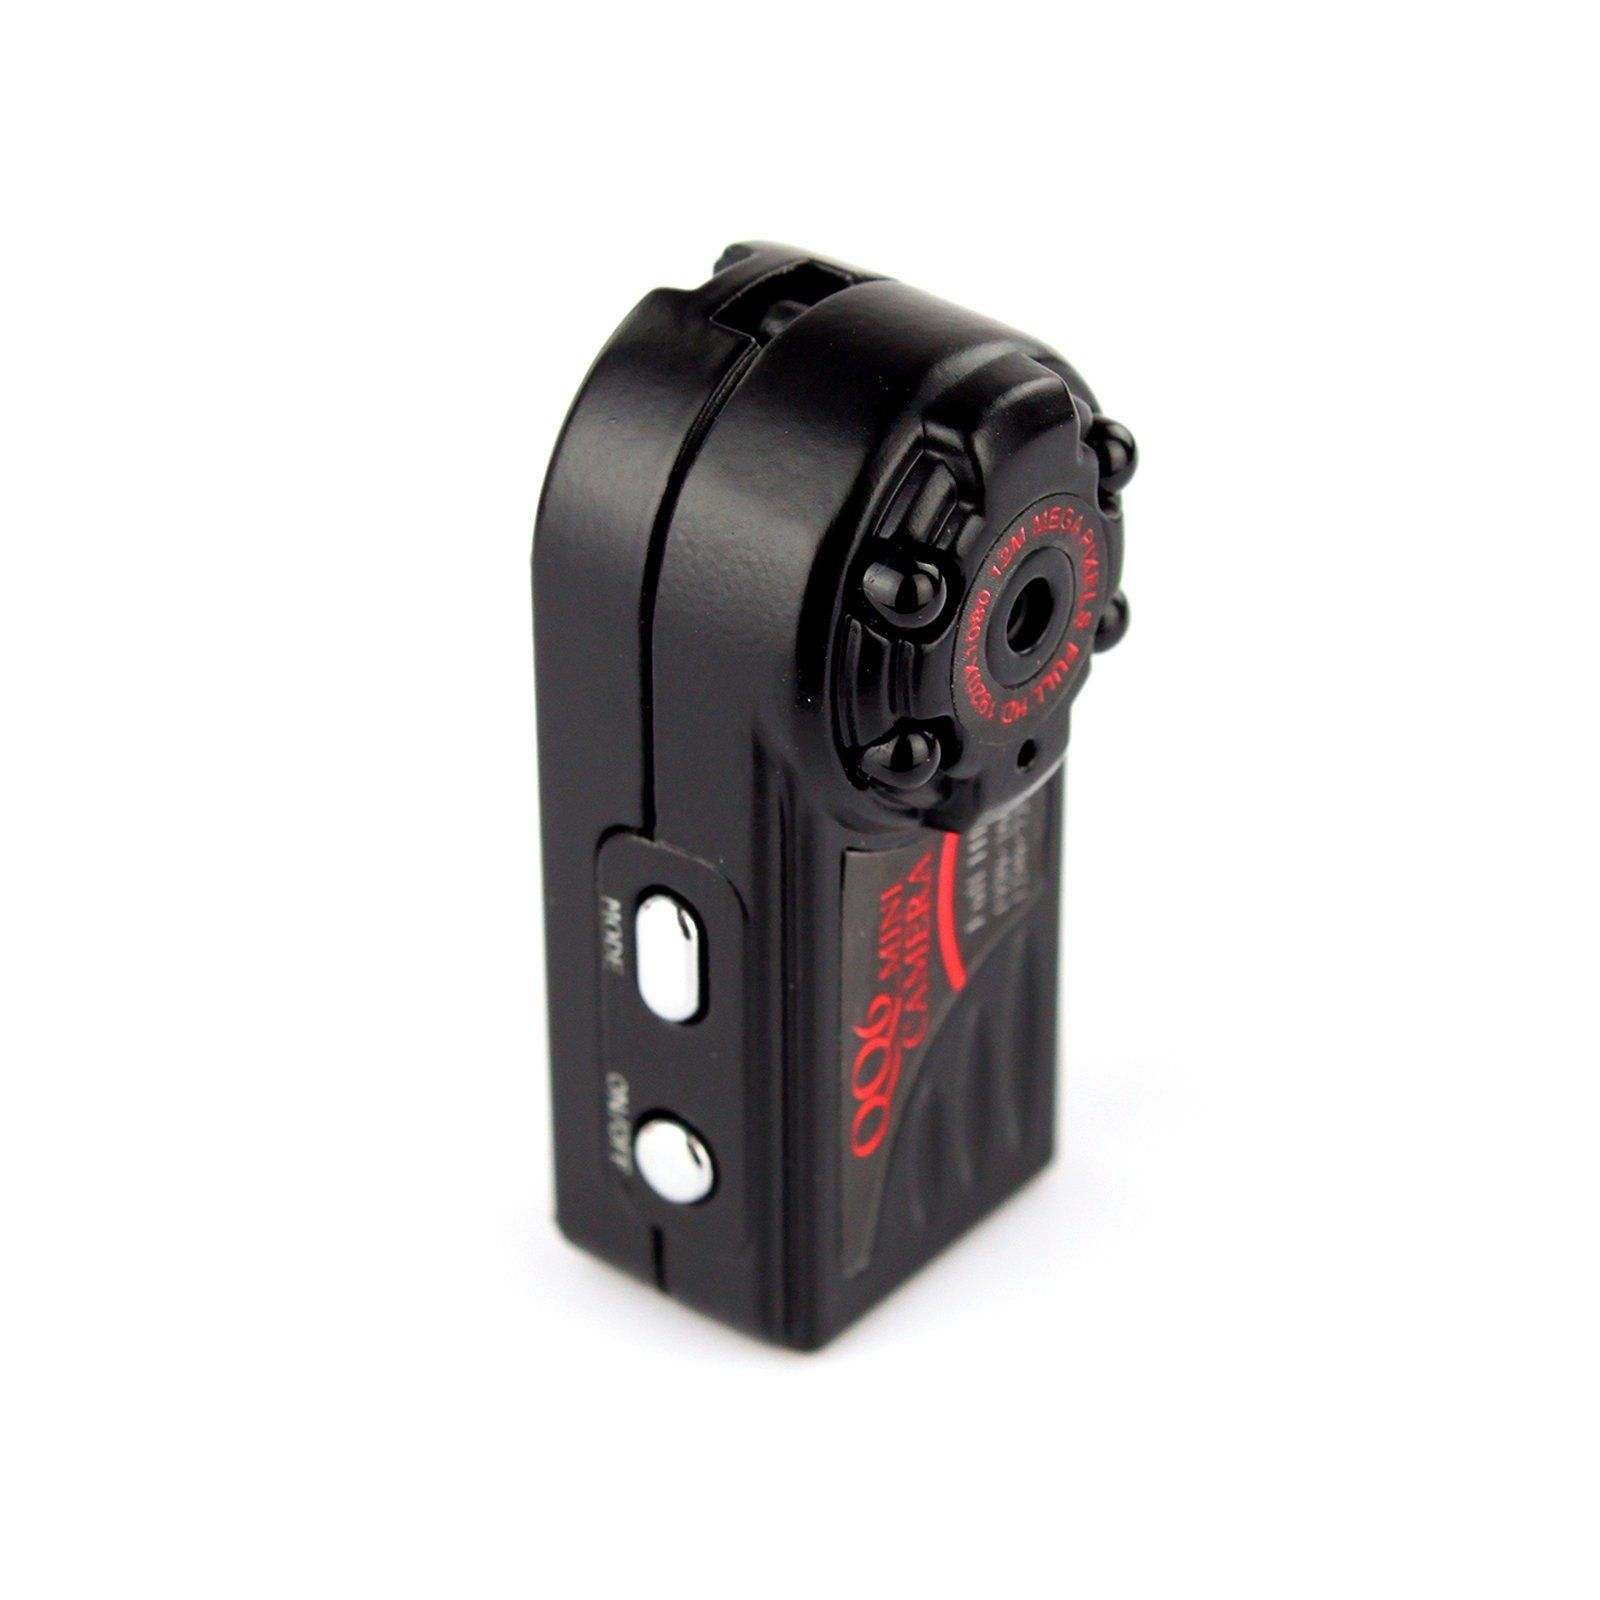 8GB Card+QQ6 Mini DV Full HD 1080P Digital Car Video Recorder Thumb Metal Mini Camera lc 08 mini dv headphone 1080p hd sport dv bluetooth headset stereo neck strap video recorder